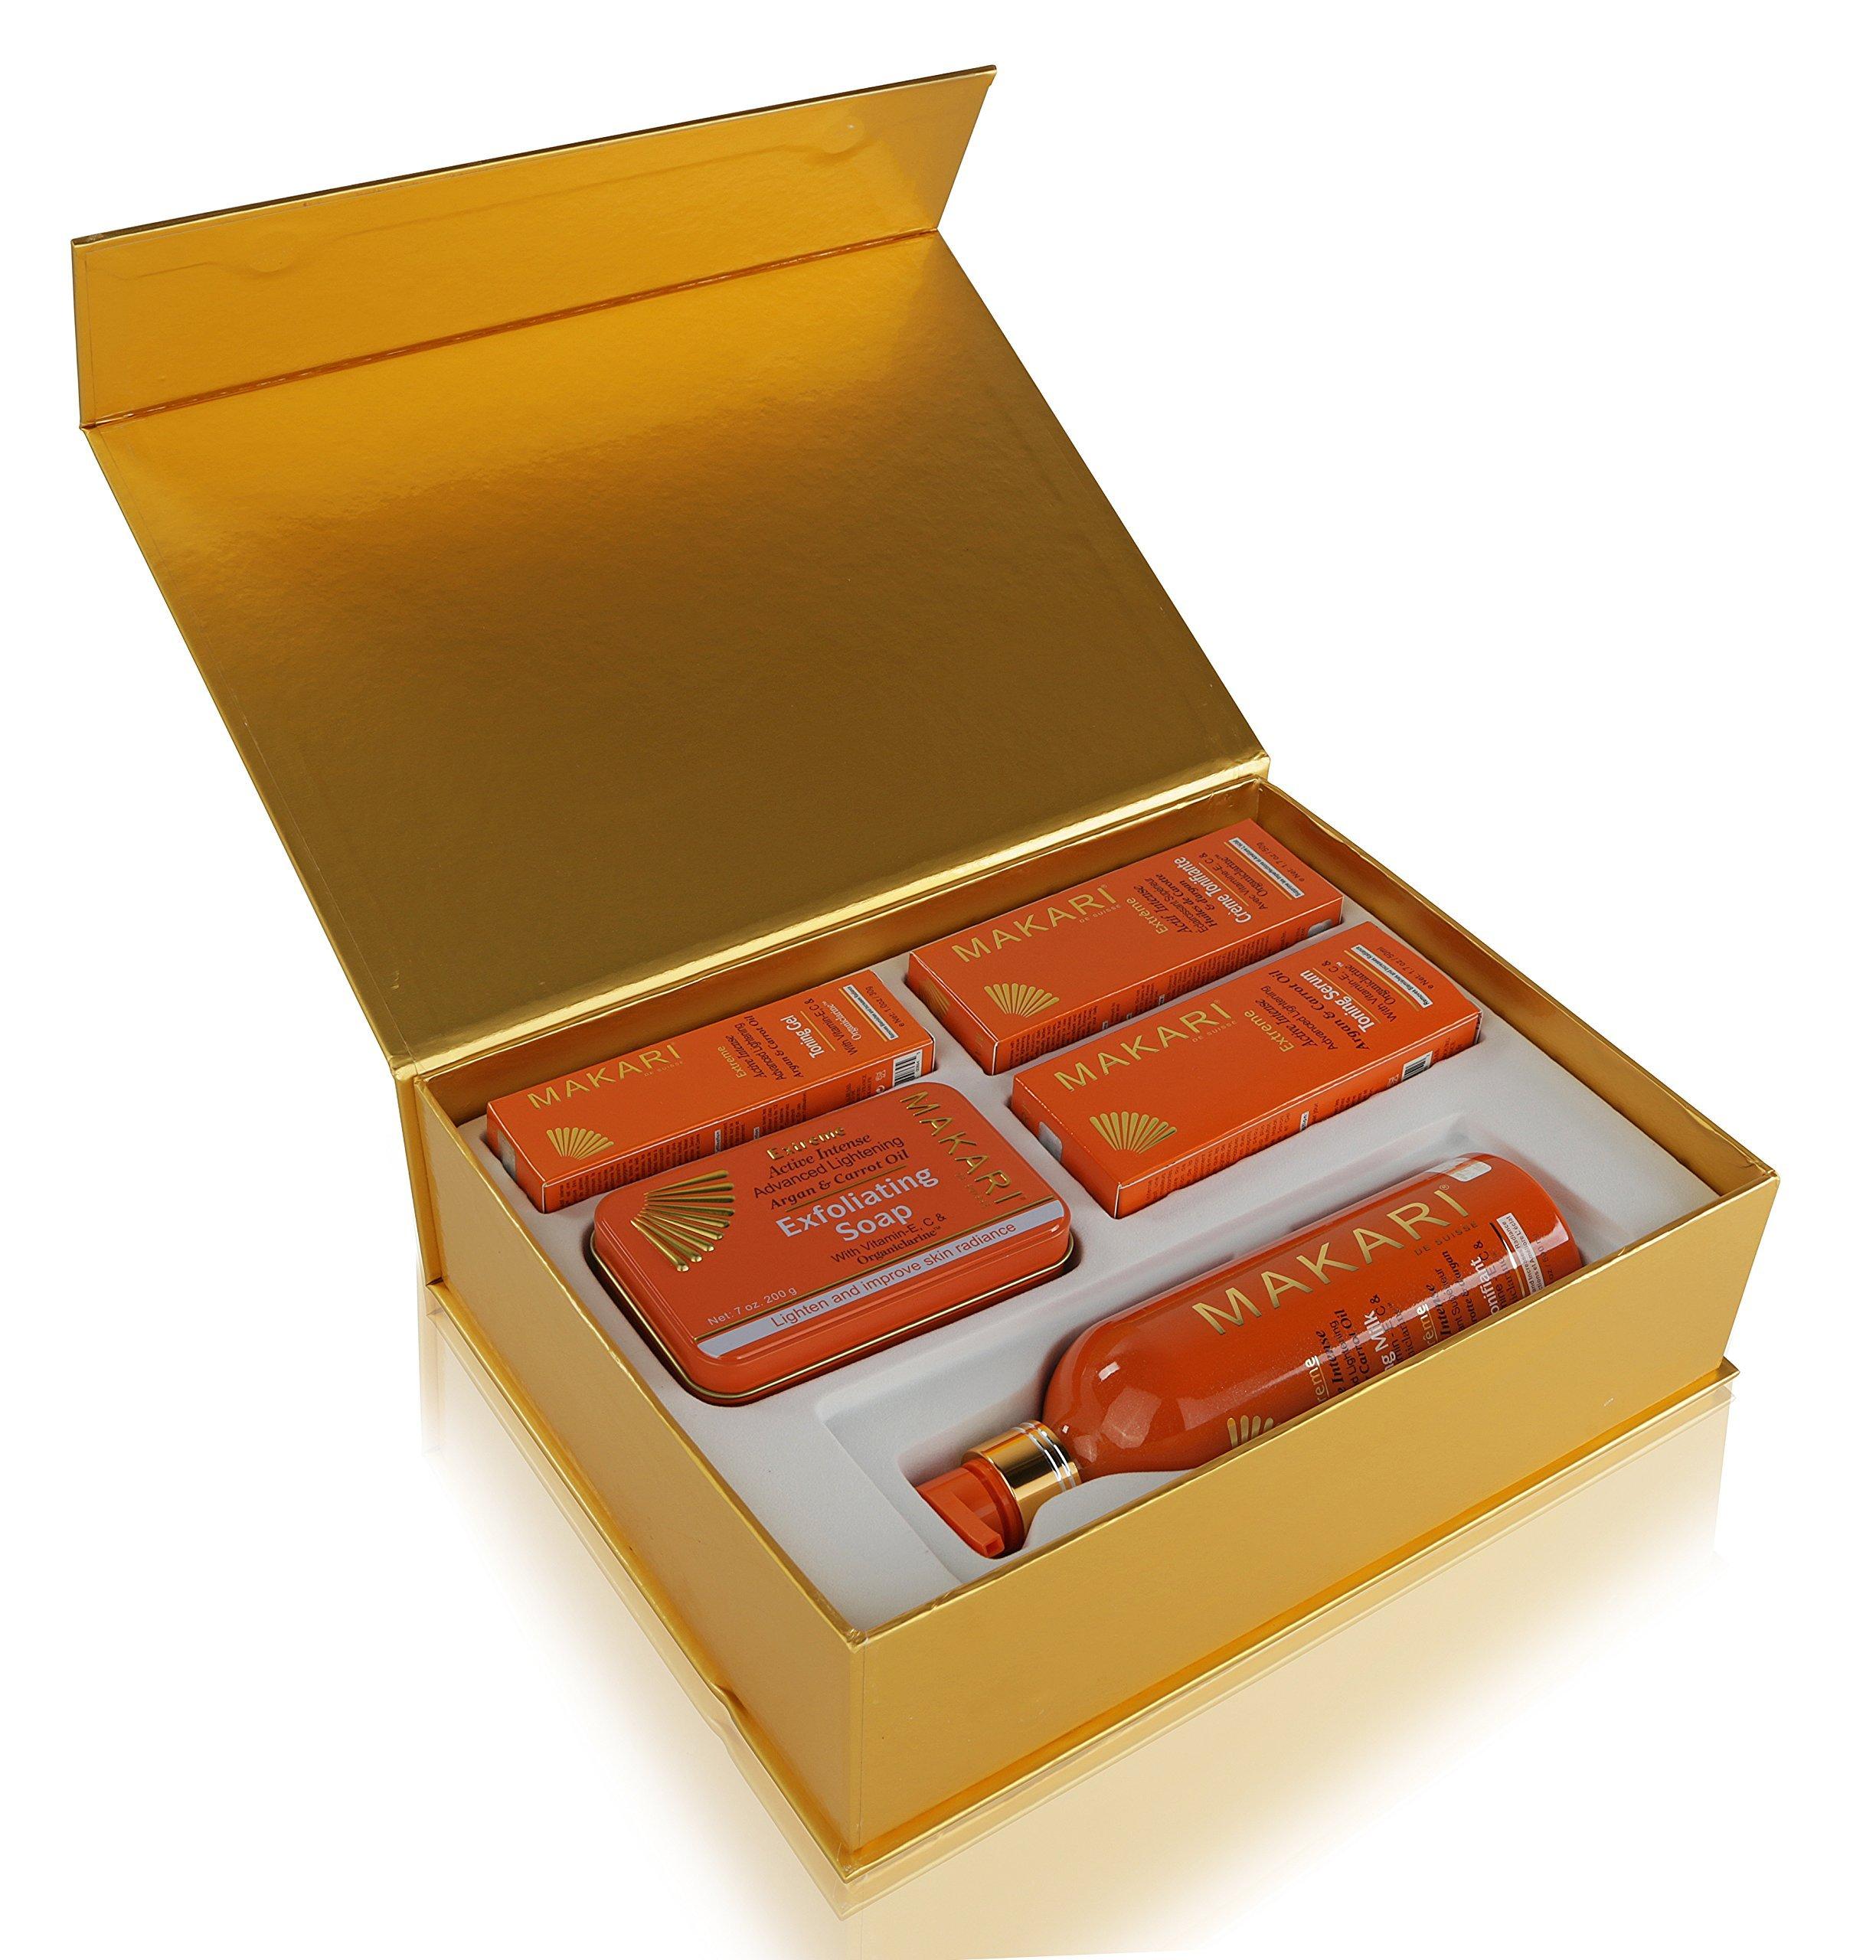 Makari Extreme Carrot & Argan Oil Skin Toning Gift Set – Complete Lightening, Brightening & Tightening Regimen with 16.8oz Body Milk, 1.7oz Cream, 1.7oz Serum, 1.0oz Gel & 7oz. Exfoliating Soap